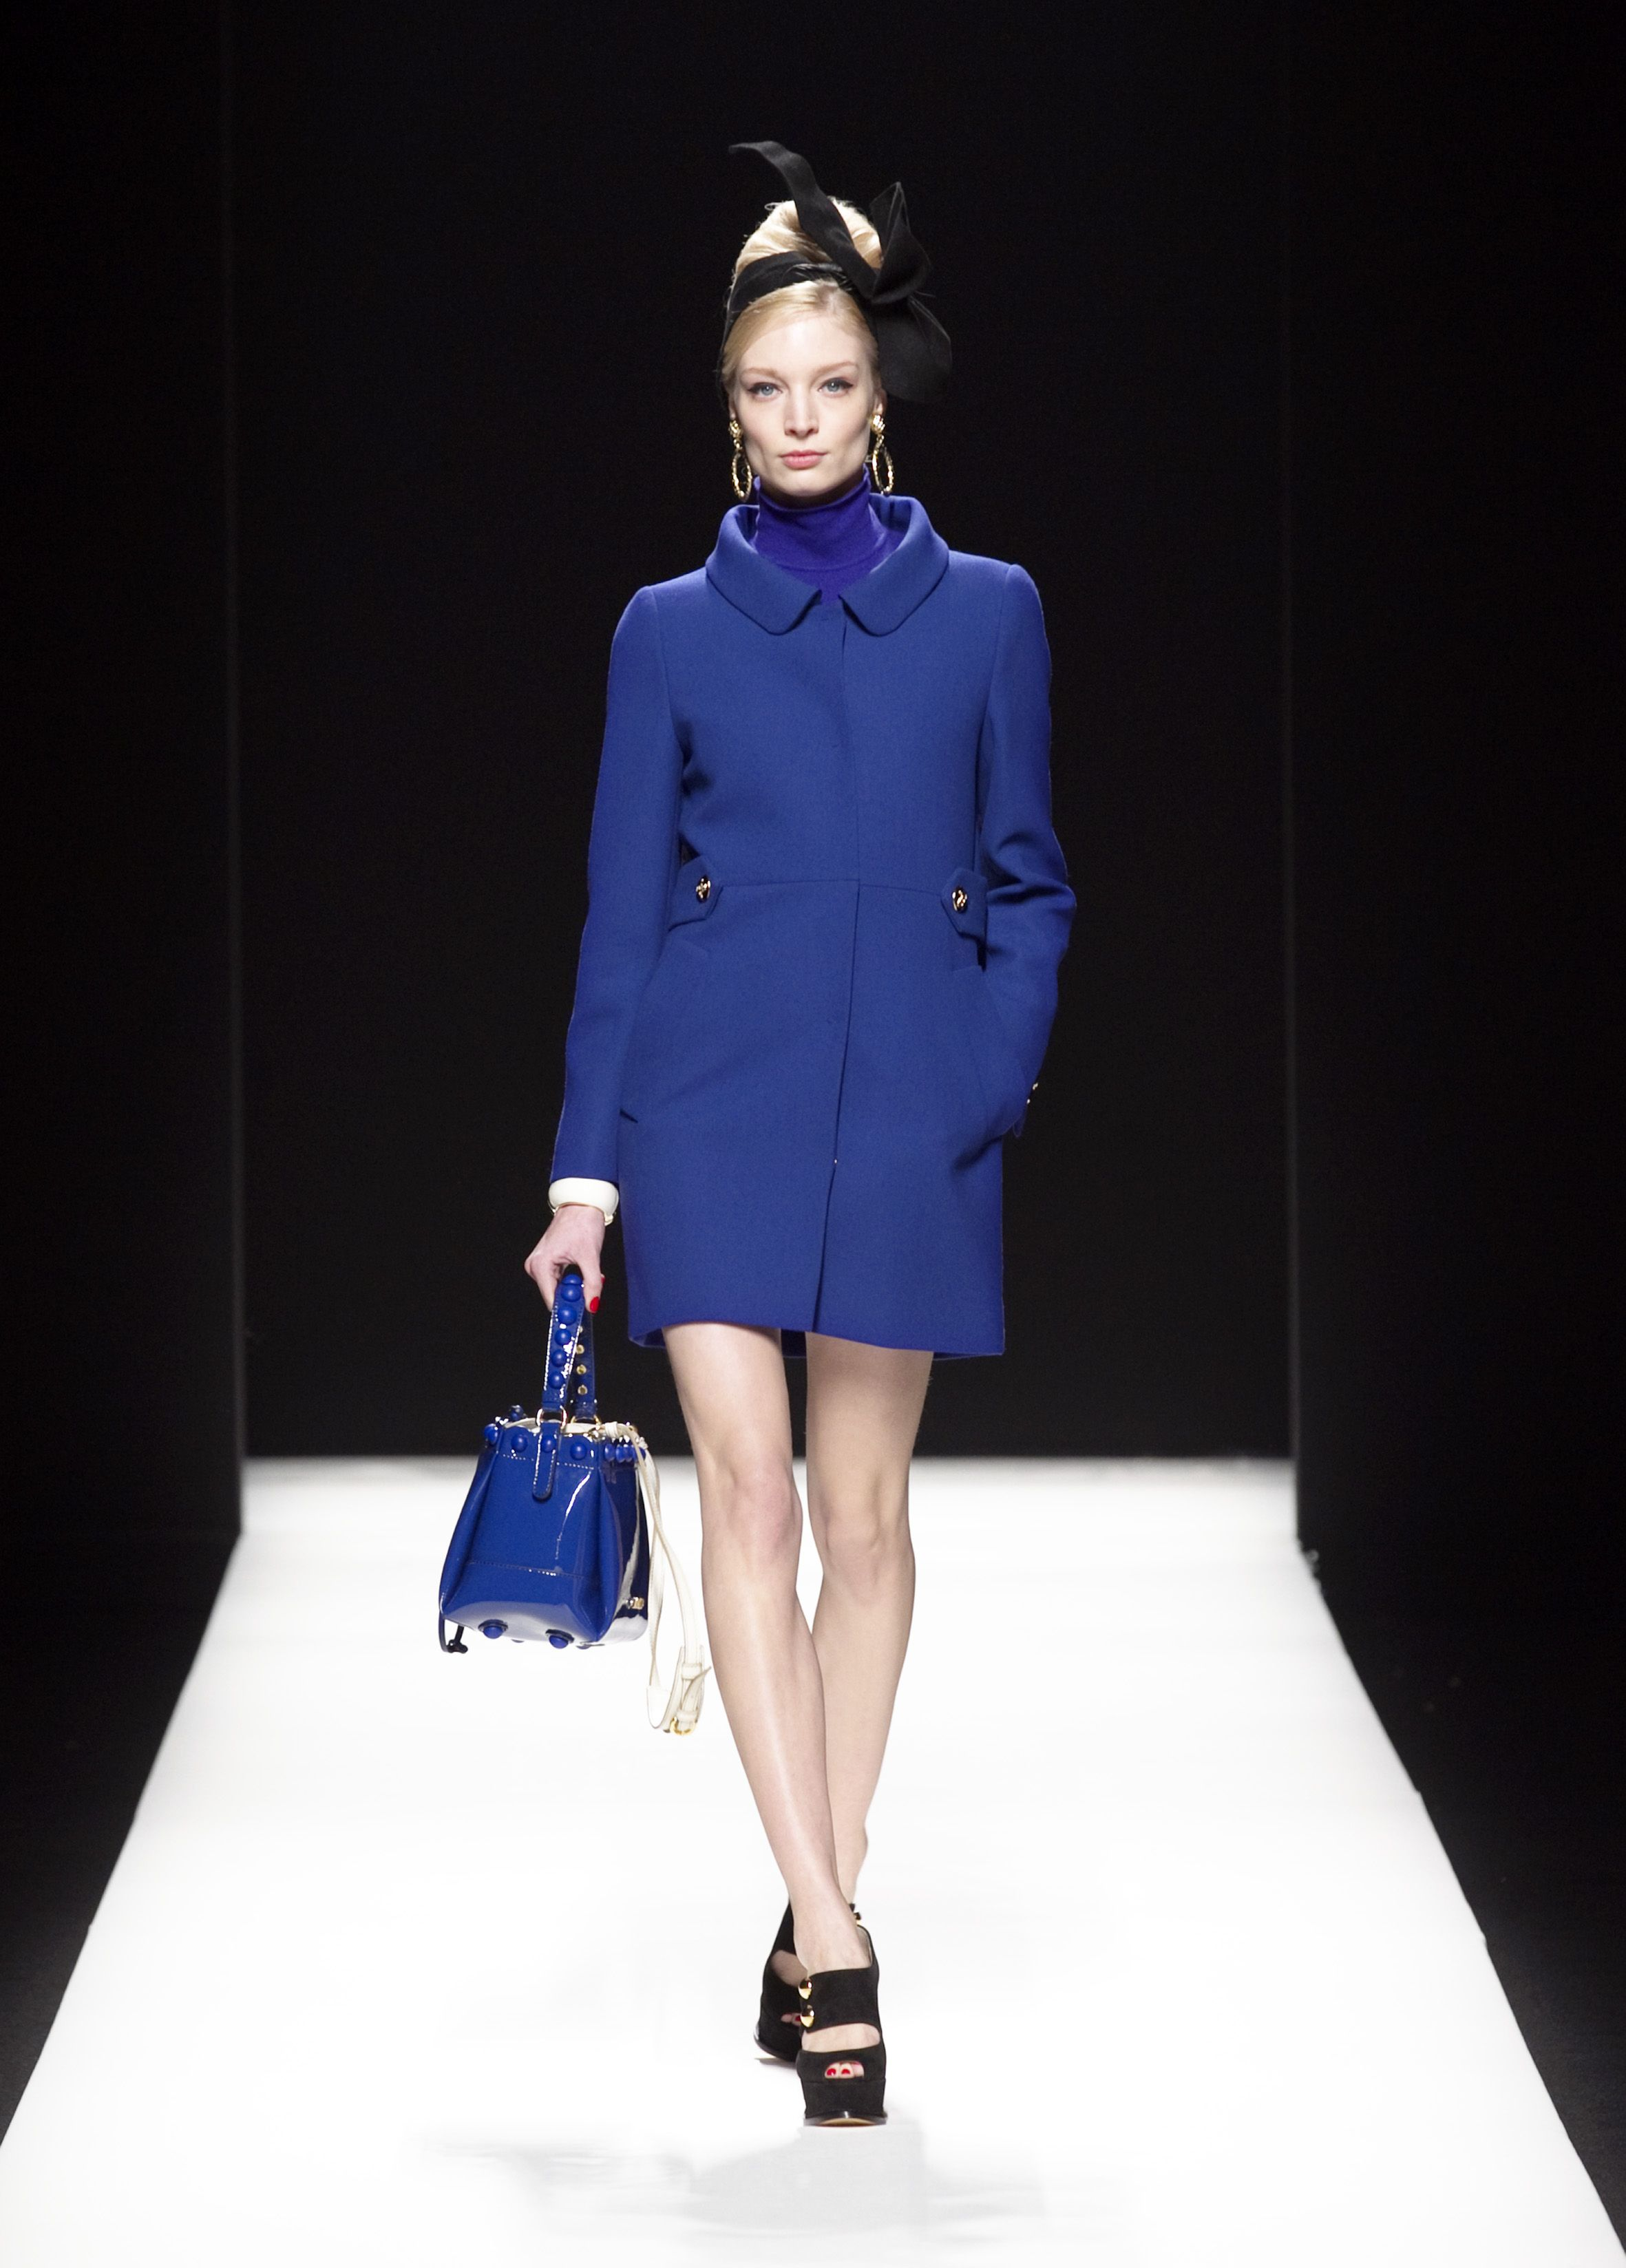 fa936c7405 Moschino Fall Winter 2012-2013 - coat